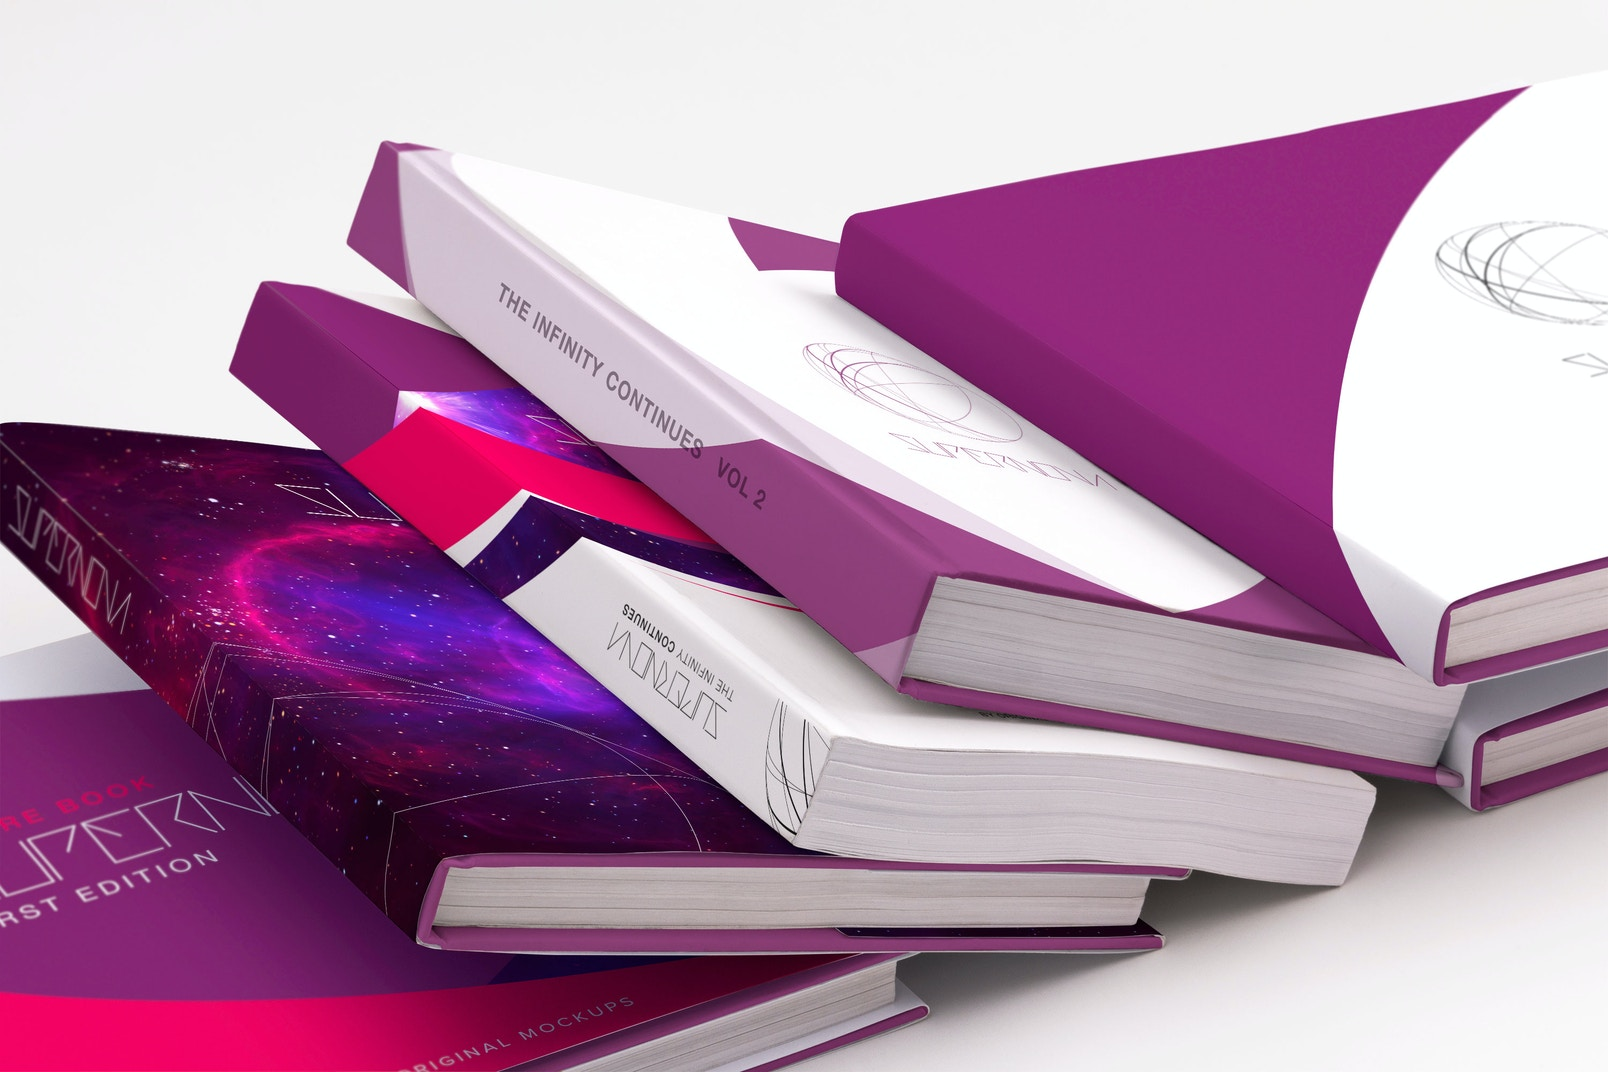 Others Books PSD Mockup 04